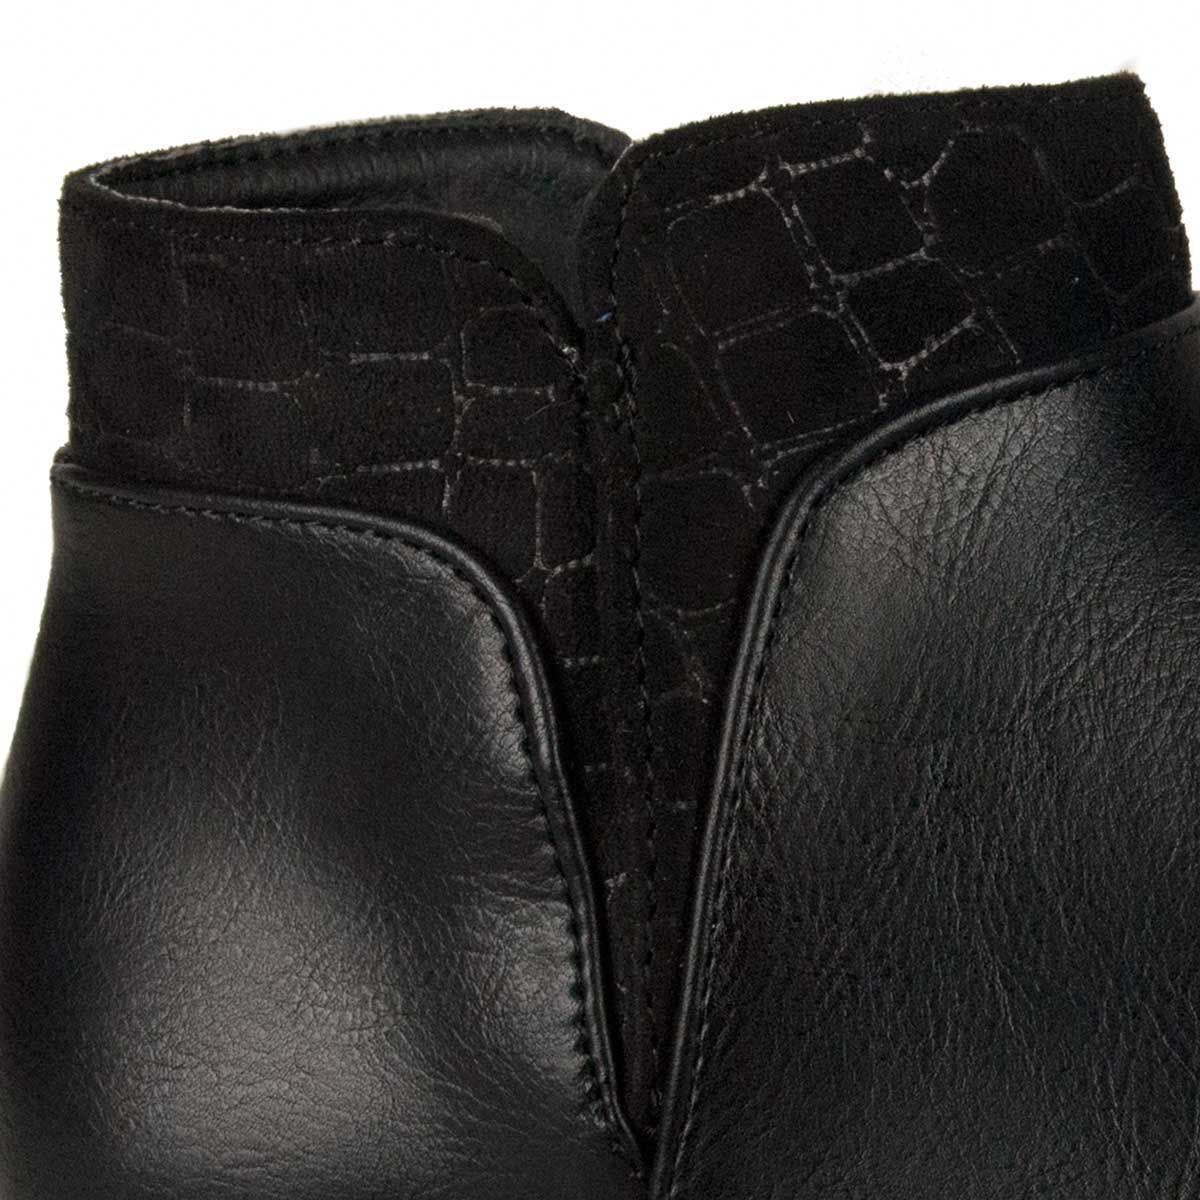 Montevita Flat Ankle Boot in Black